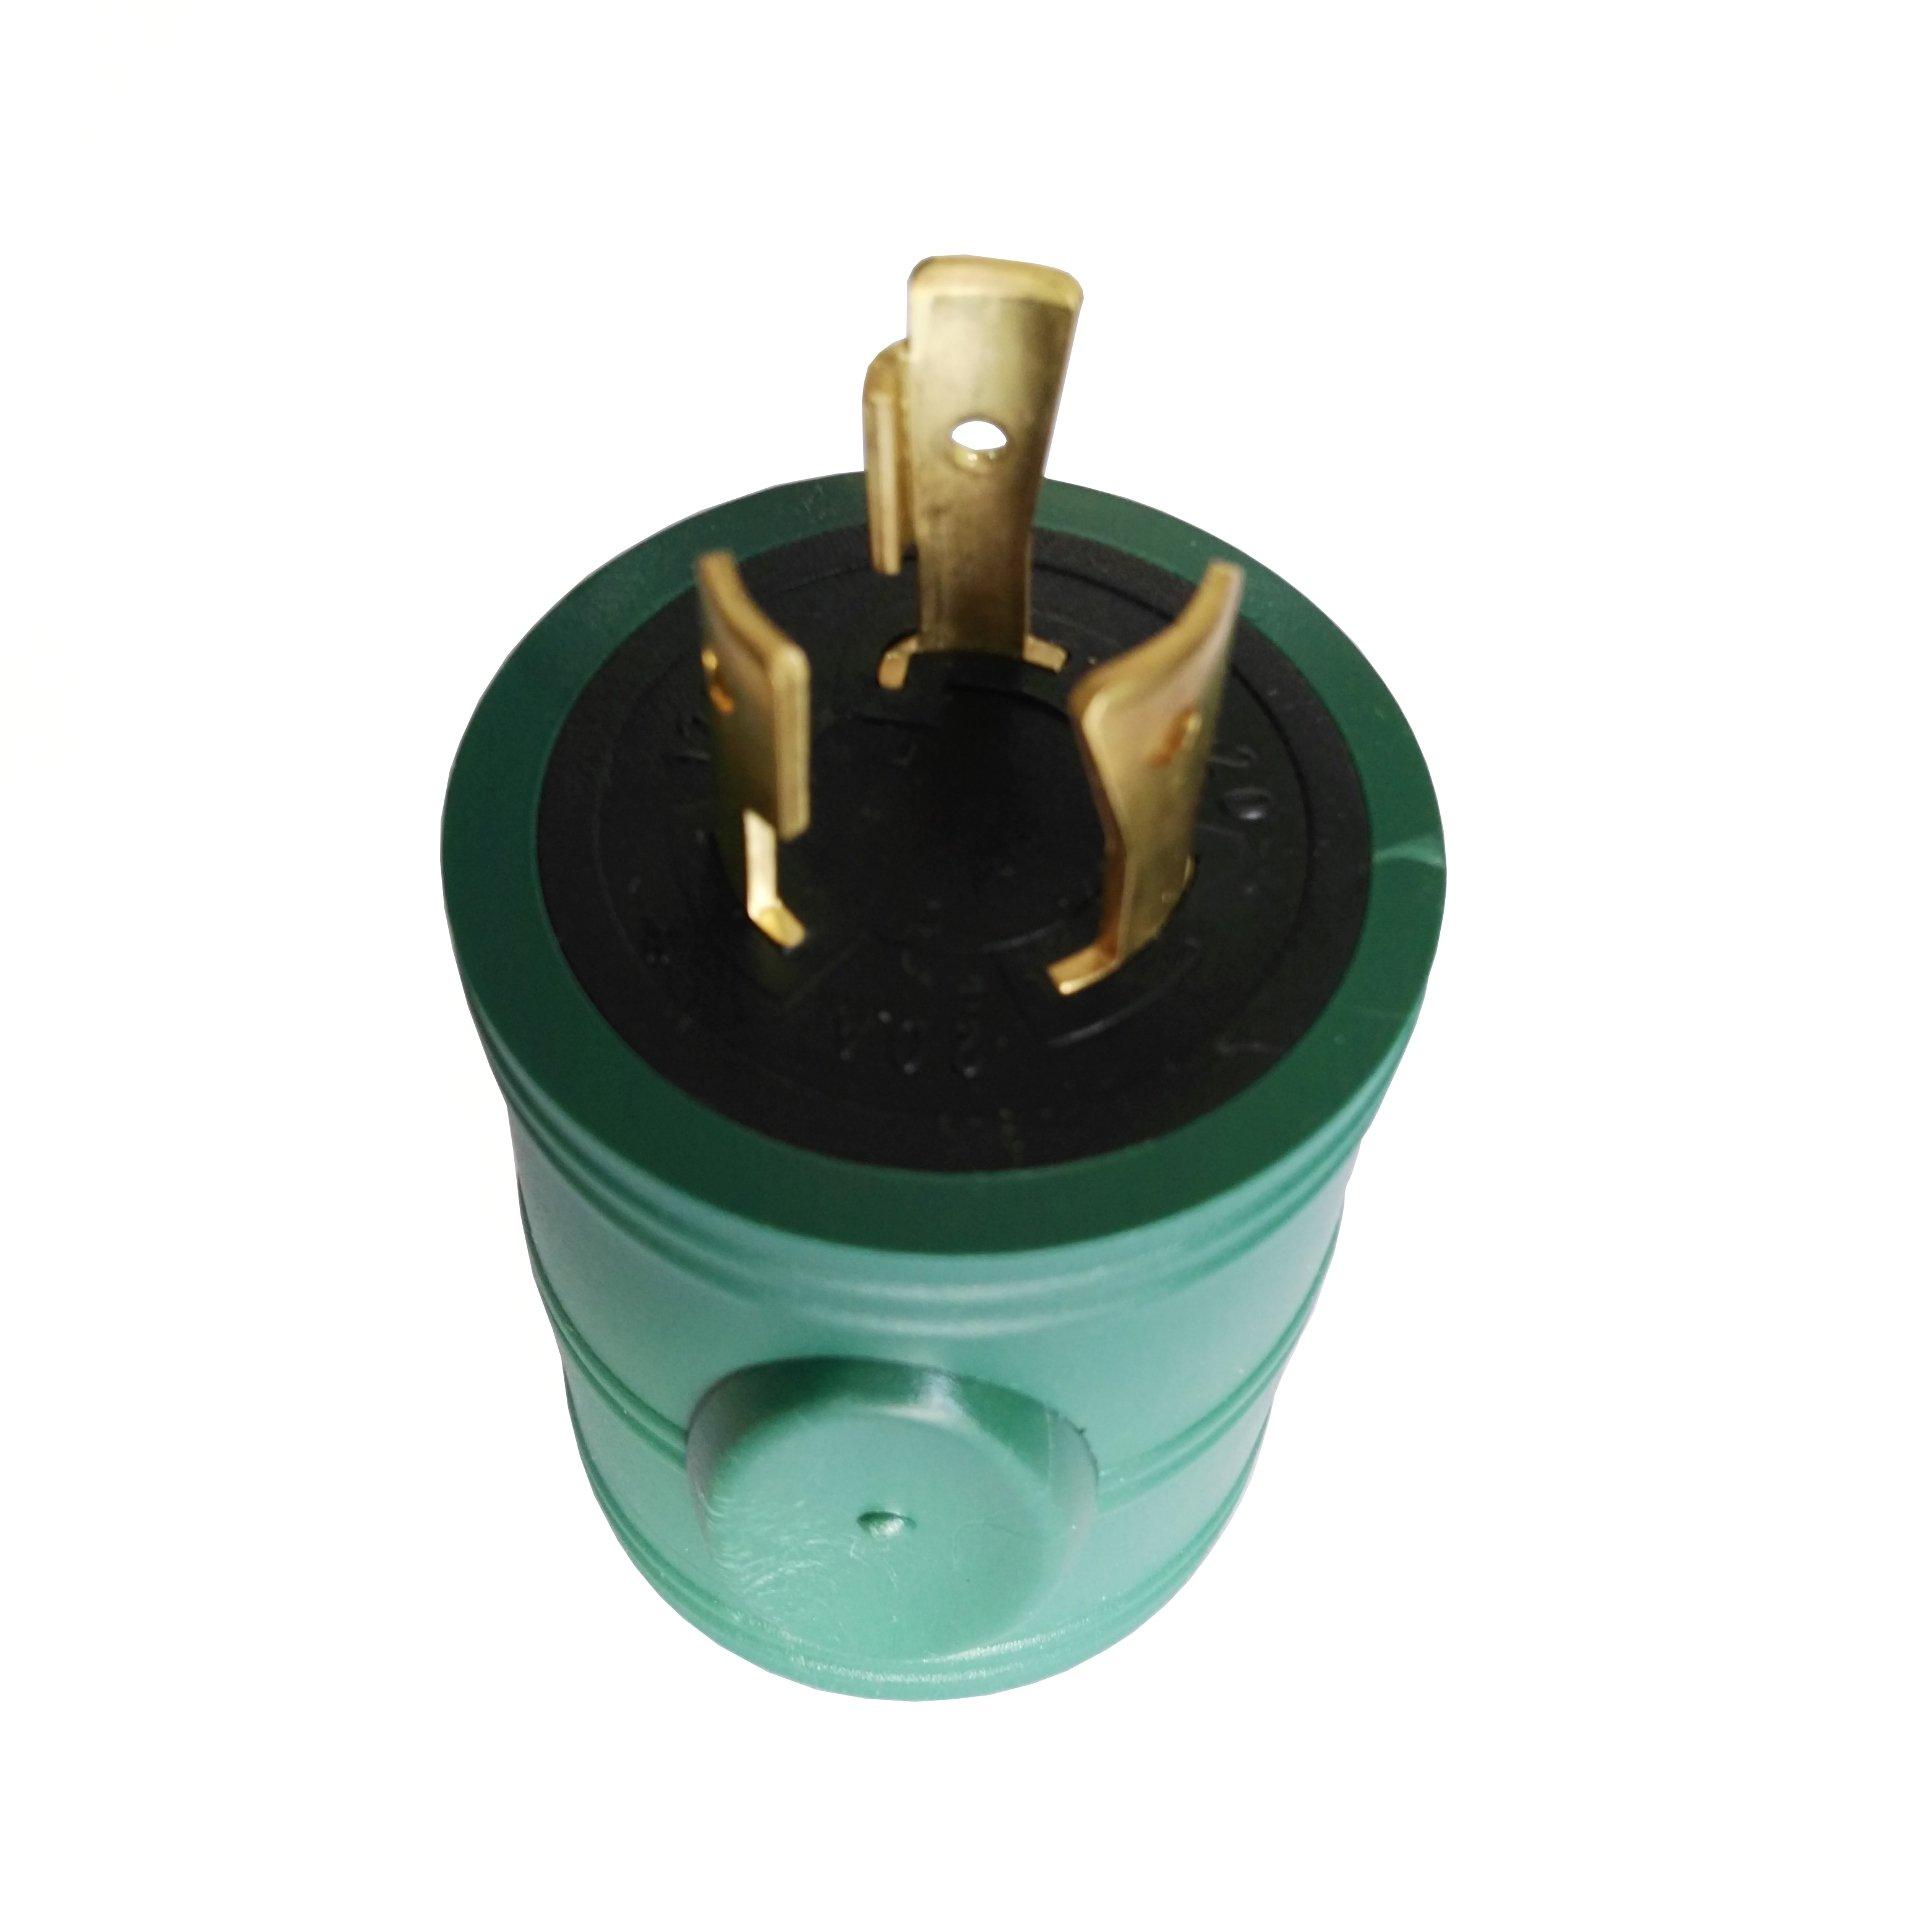 Parkworld 691777 20 AMP Power Adapter 3-Prong Generator Locking L5-20 Male Plug to RV TT-30 Female Receptacle, Green